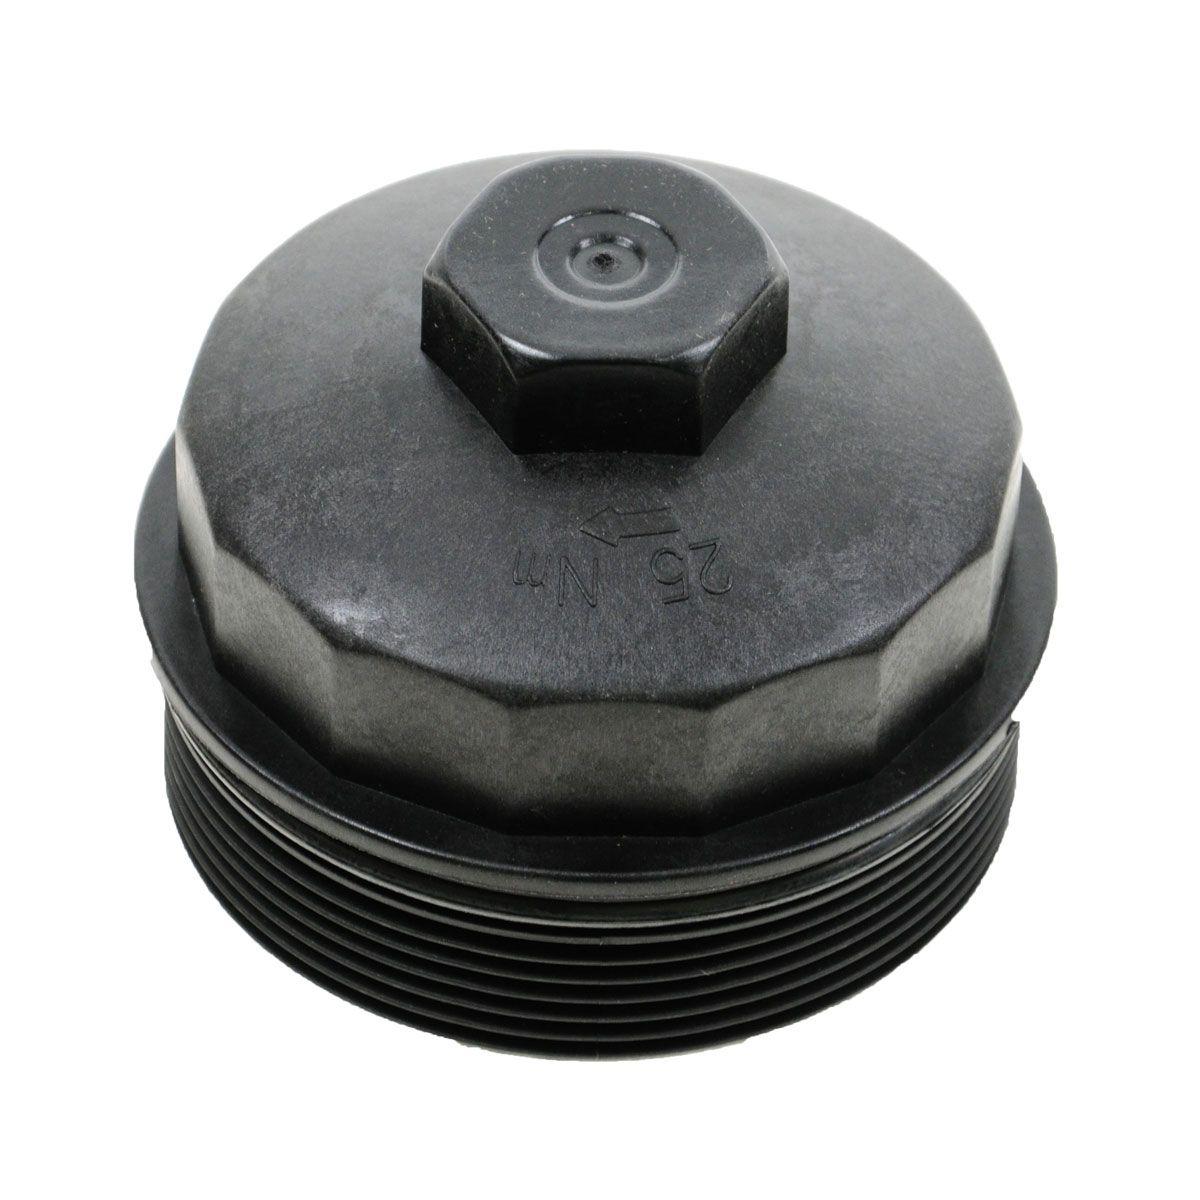 hight resolution of dorman frame fuel filter or oil filter housing cap gasket for ford pickup